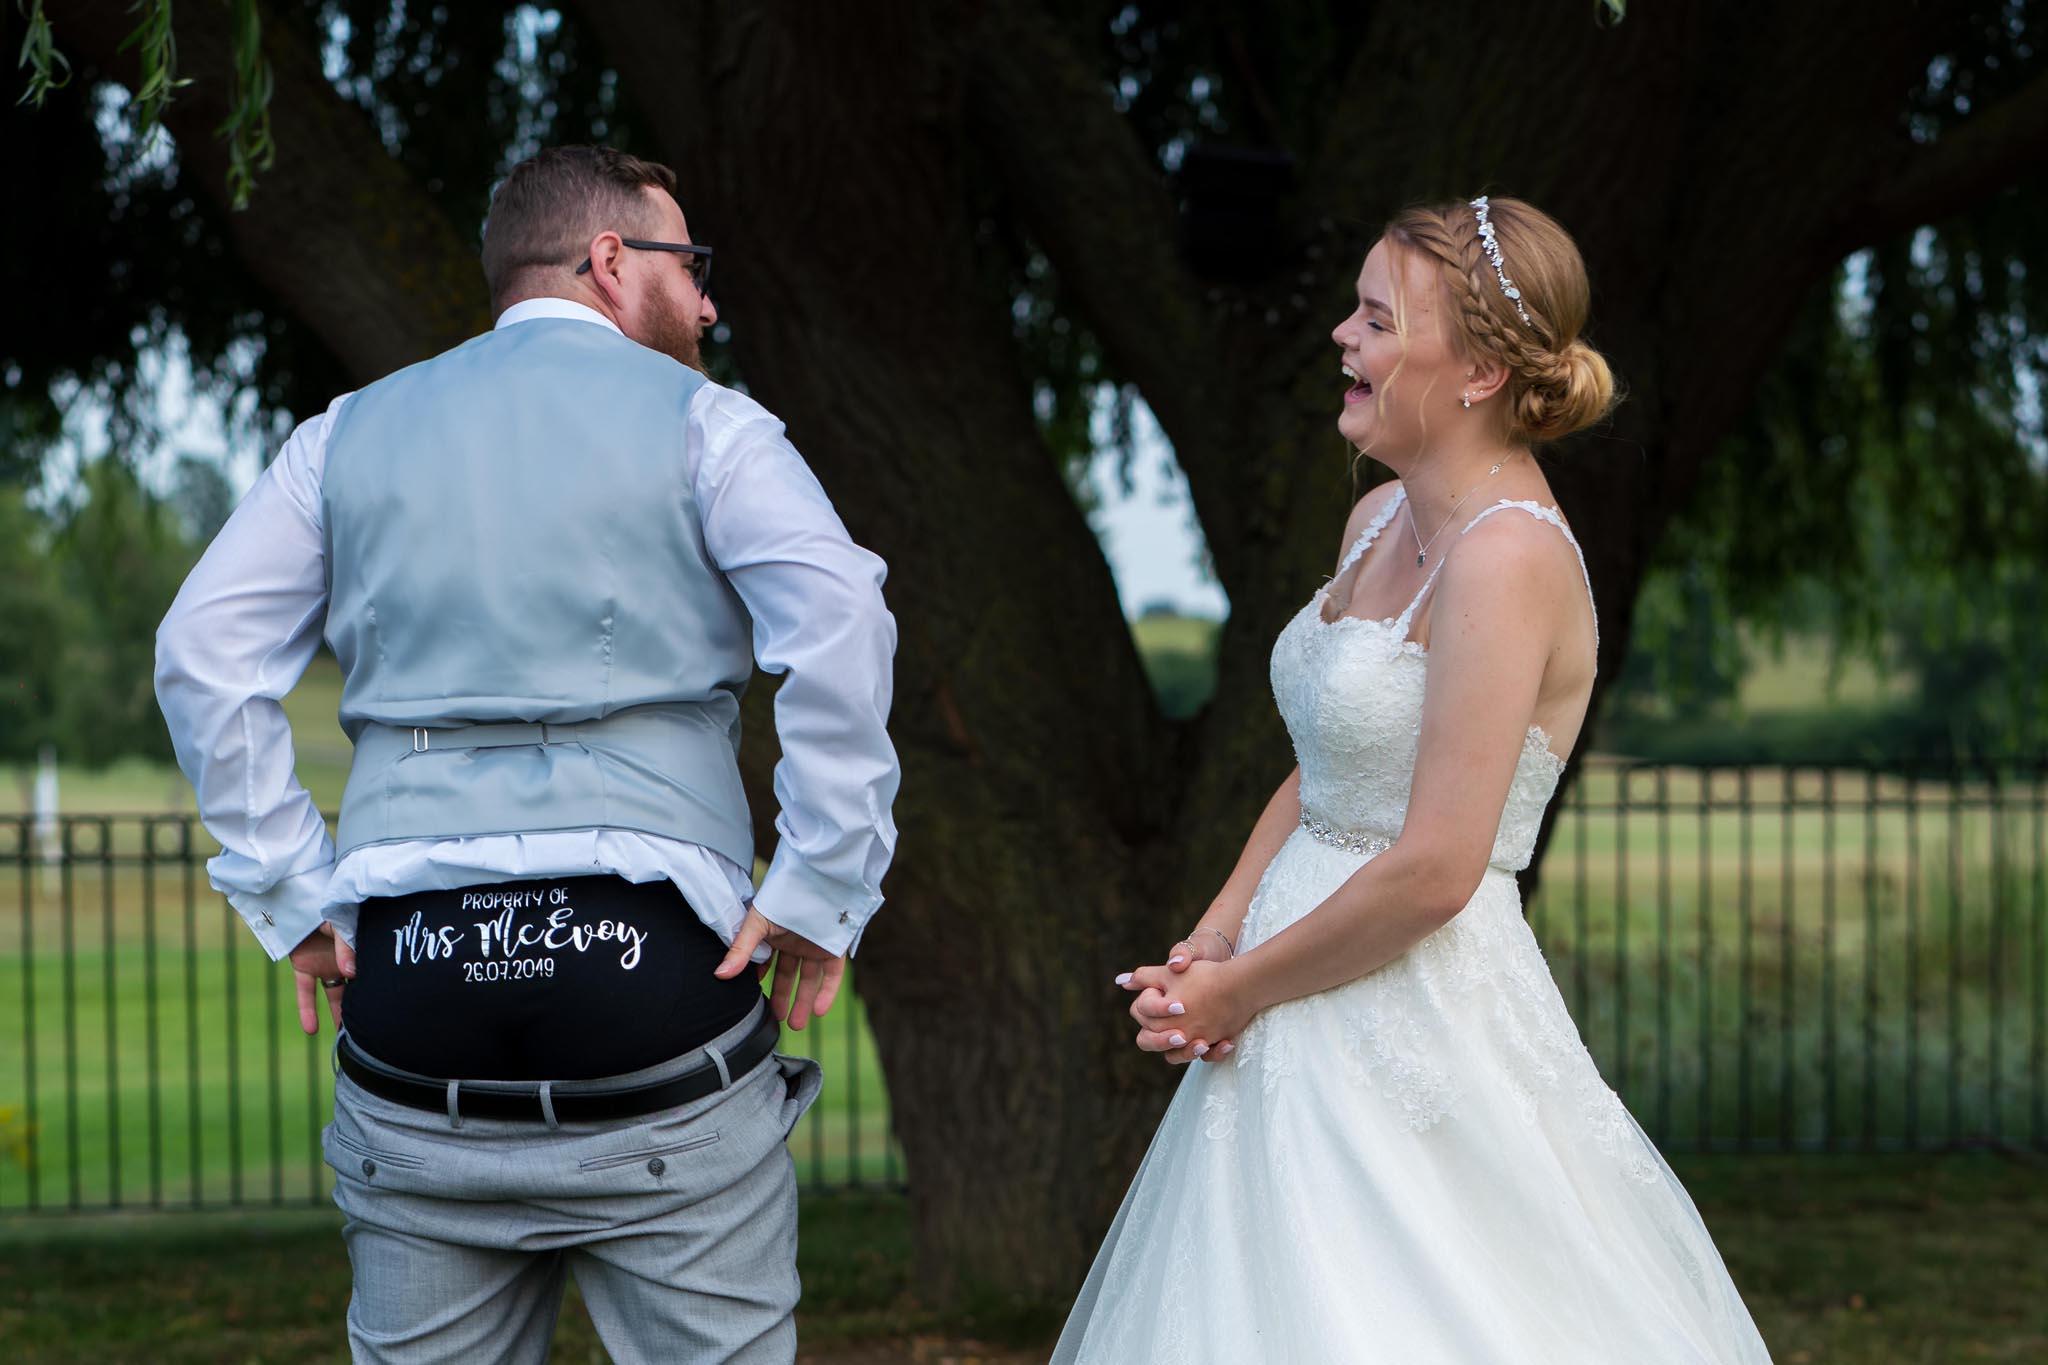 604-Bride-groom-Luke-Yasmin-The-Rayleigh-Club-Wedding-Photography.jpg